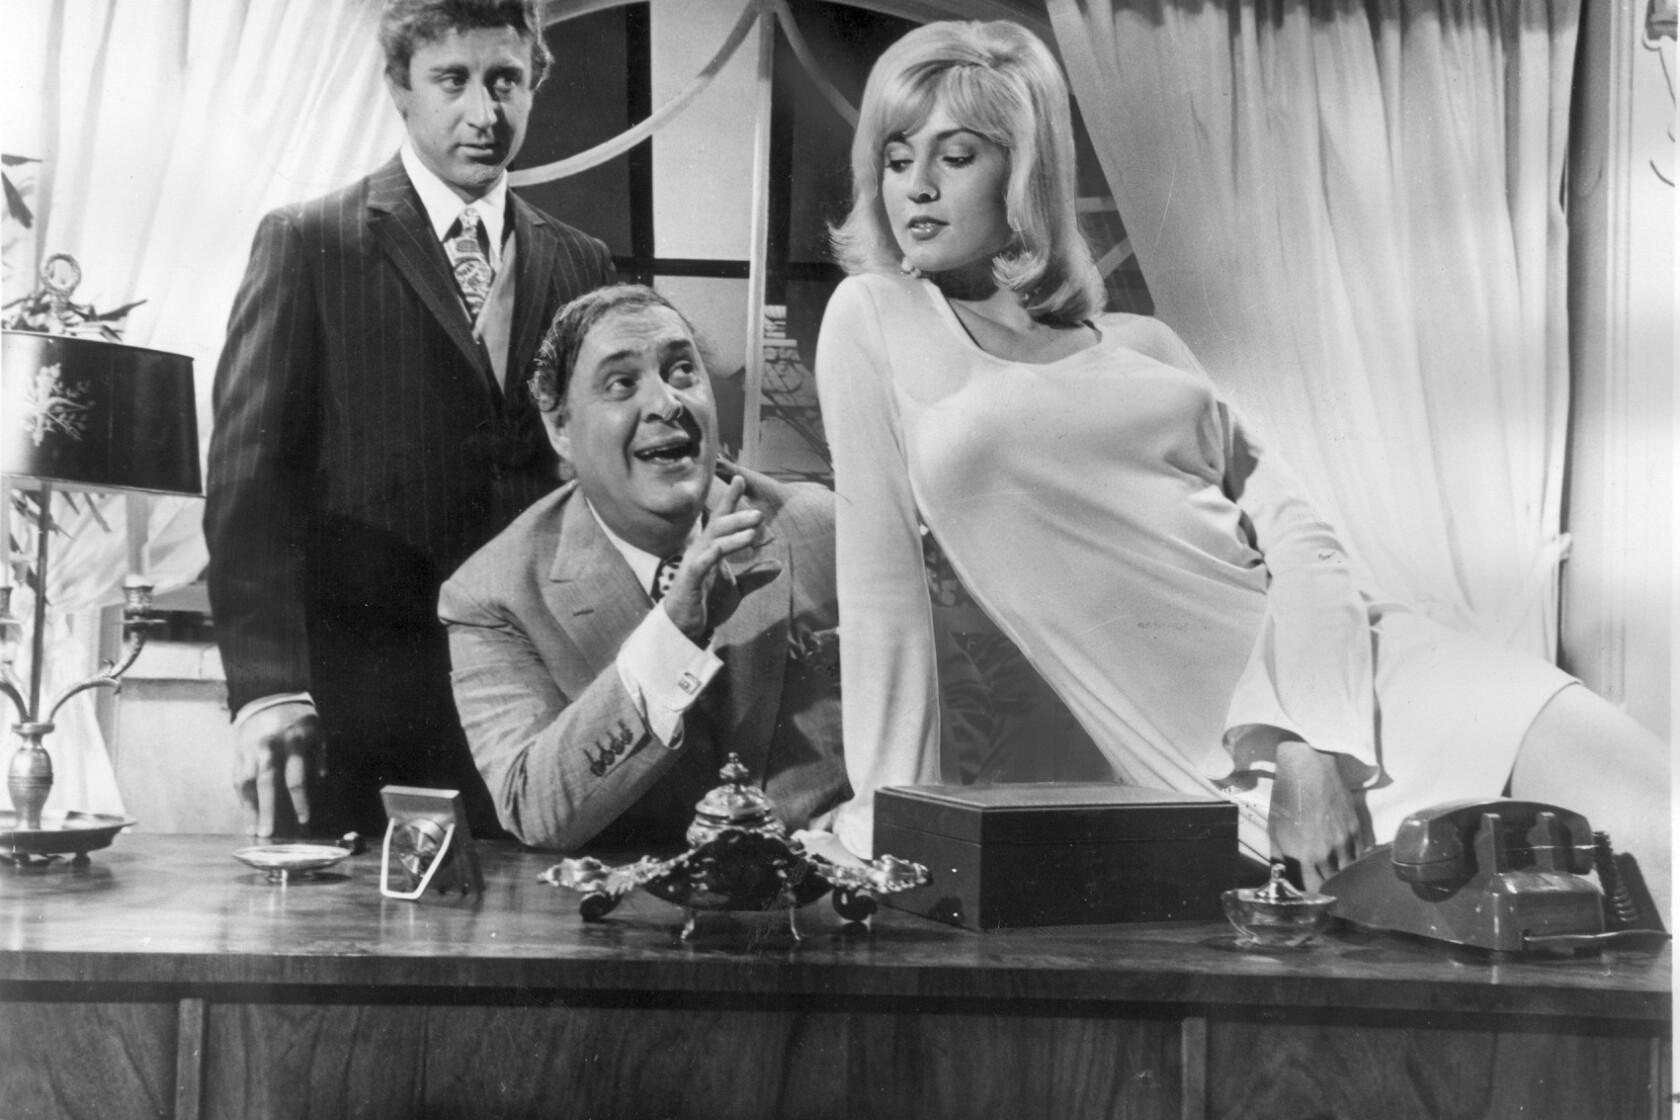 Why Gene Wilder gave Gilda Radner's name to Cedars-Sinai for its